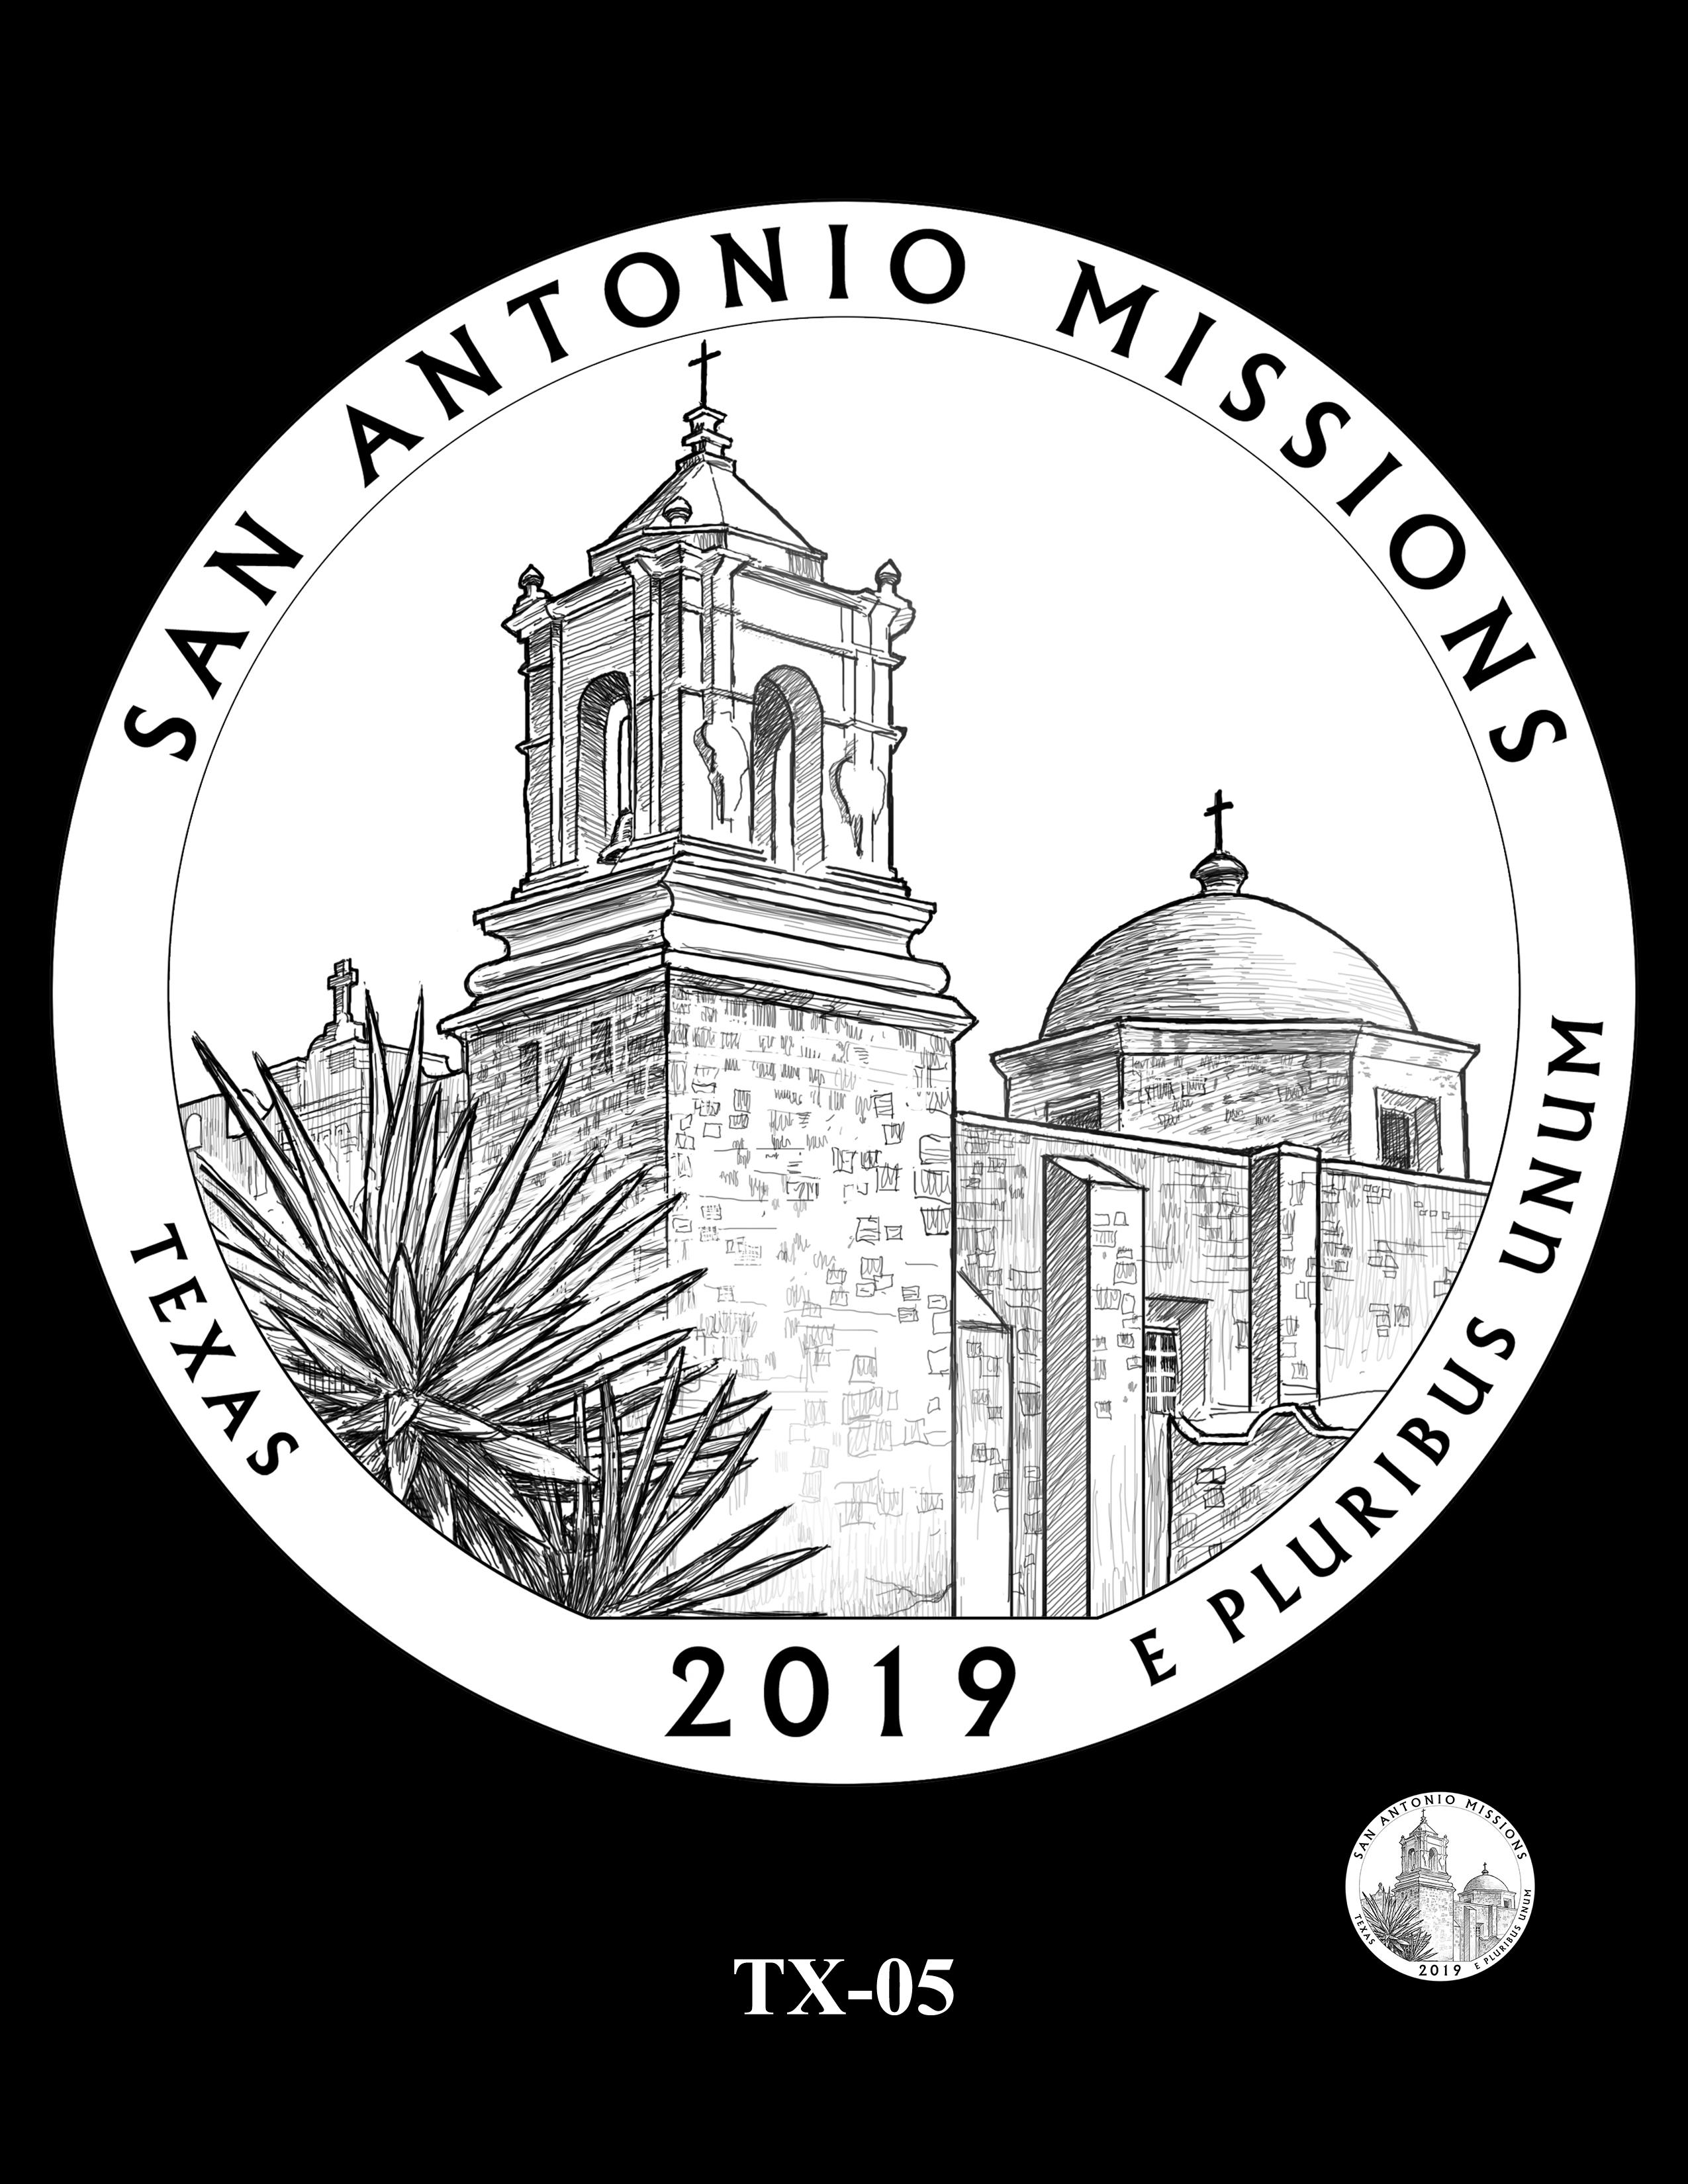 TX-05 -- 2019 America the Beautiful Quarters® Program